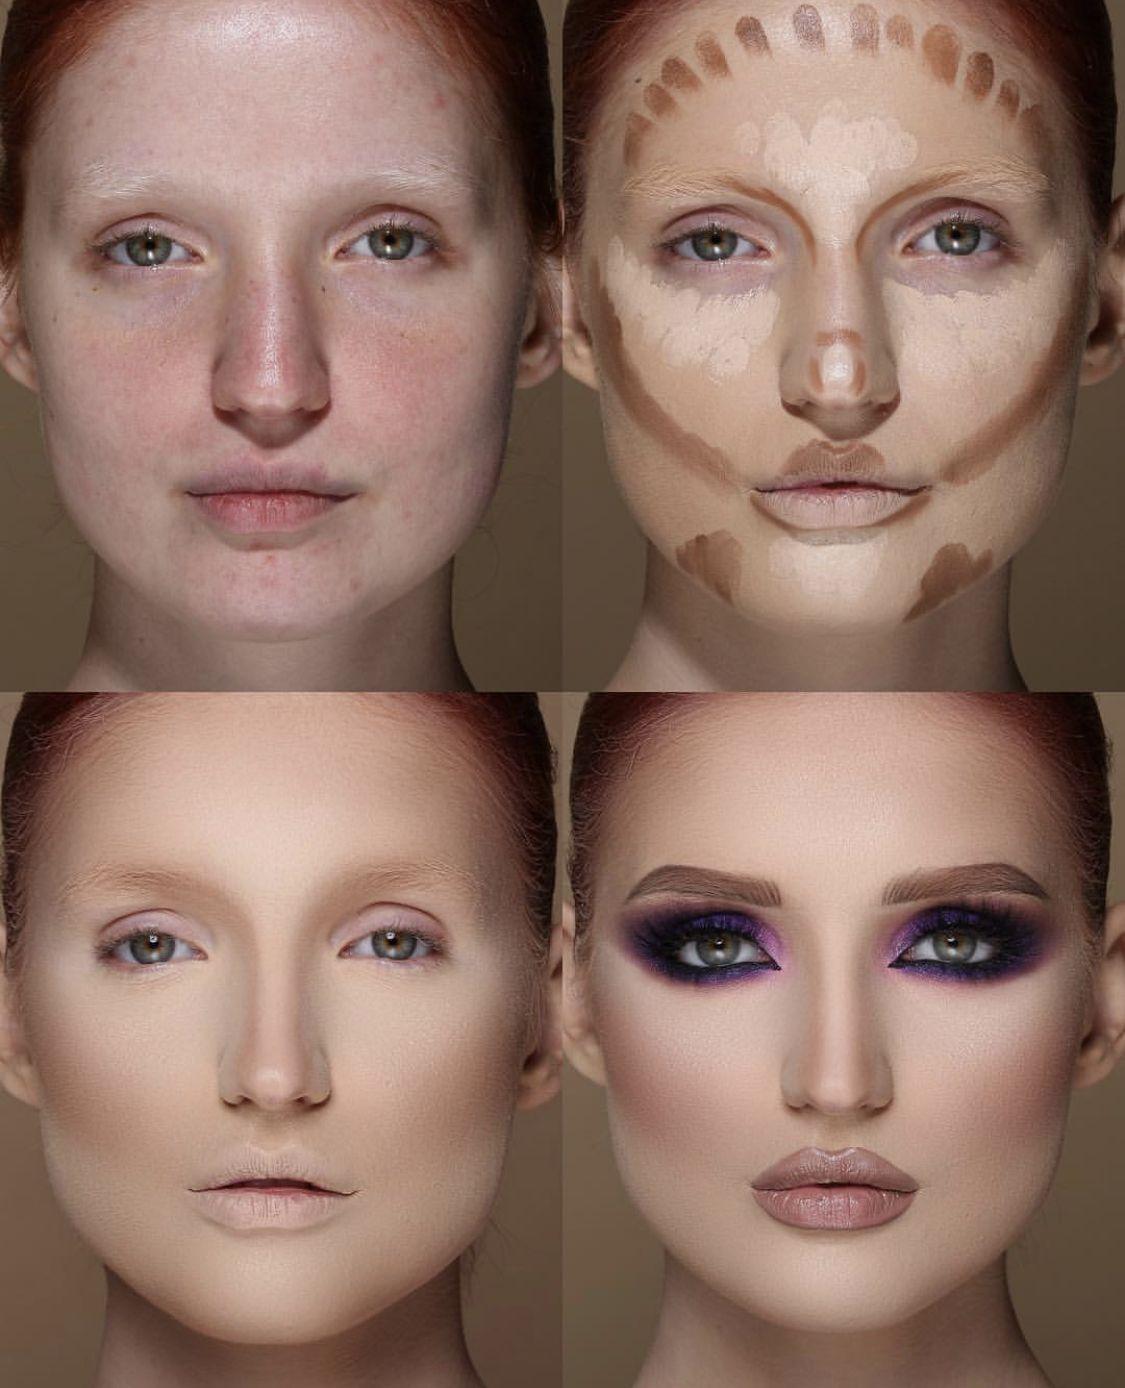 Pin By Cesareus On Make Up Redhead Highlighter Makeup Contour Makeup Best Contouring Products